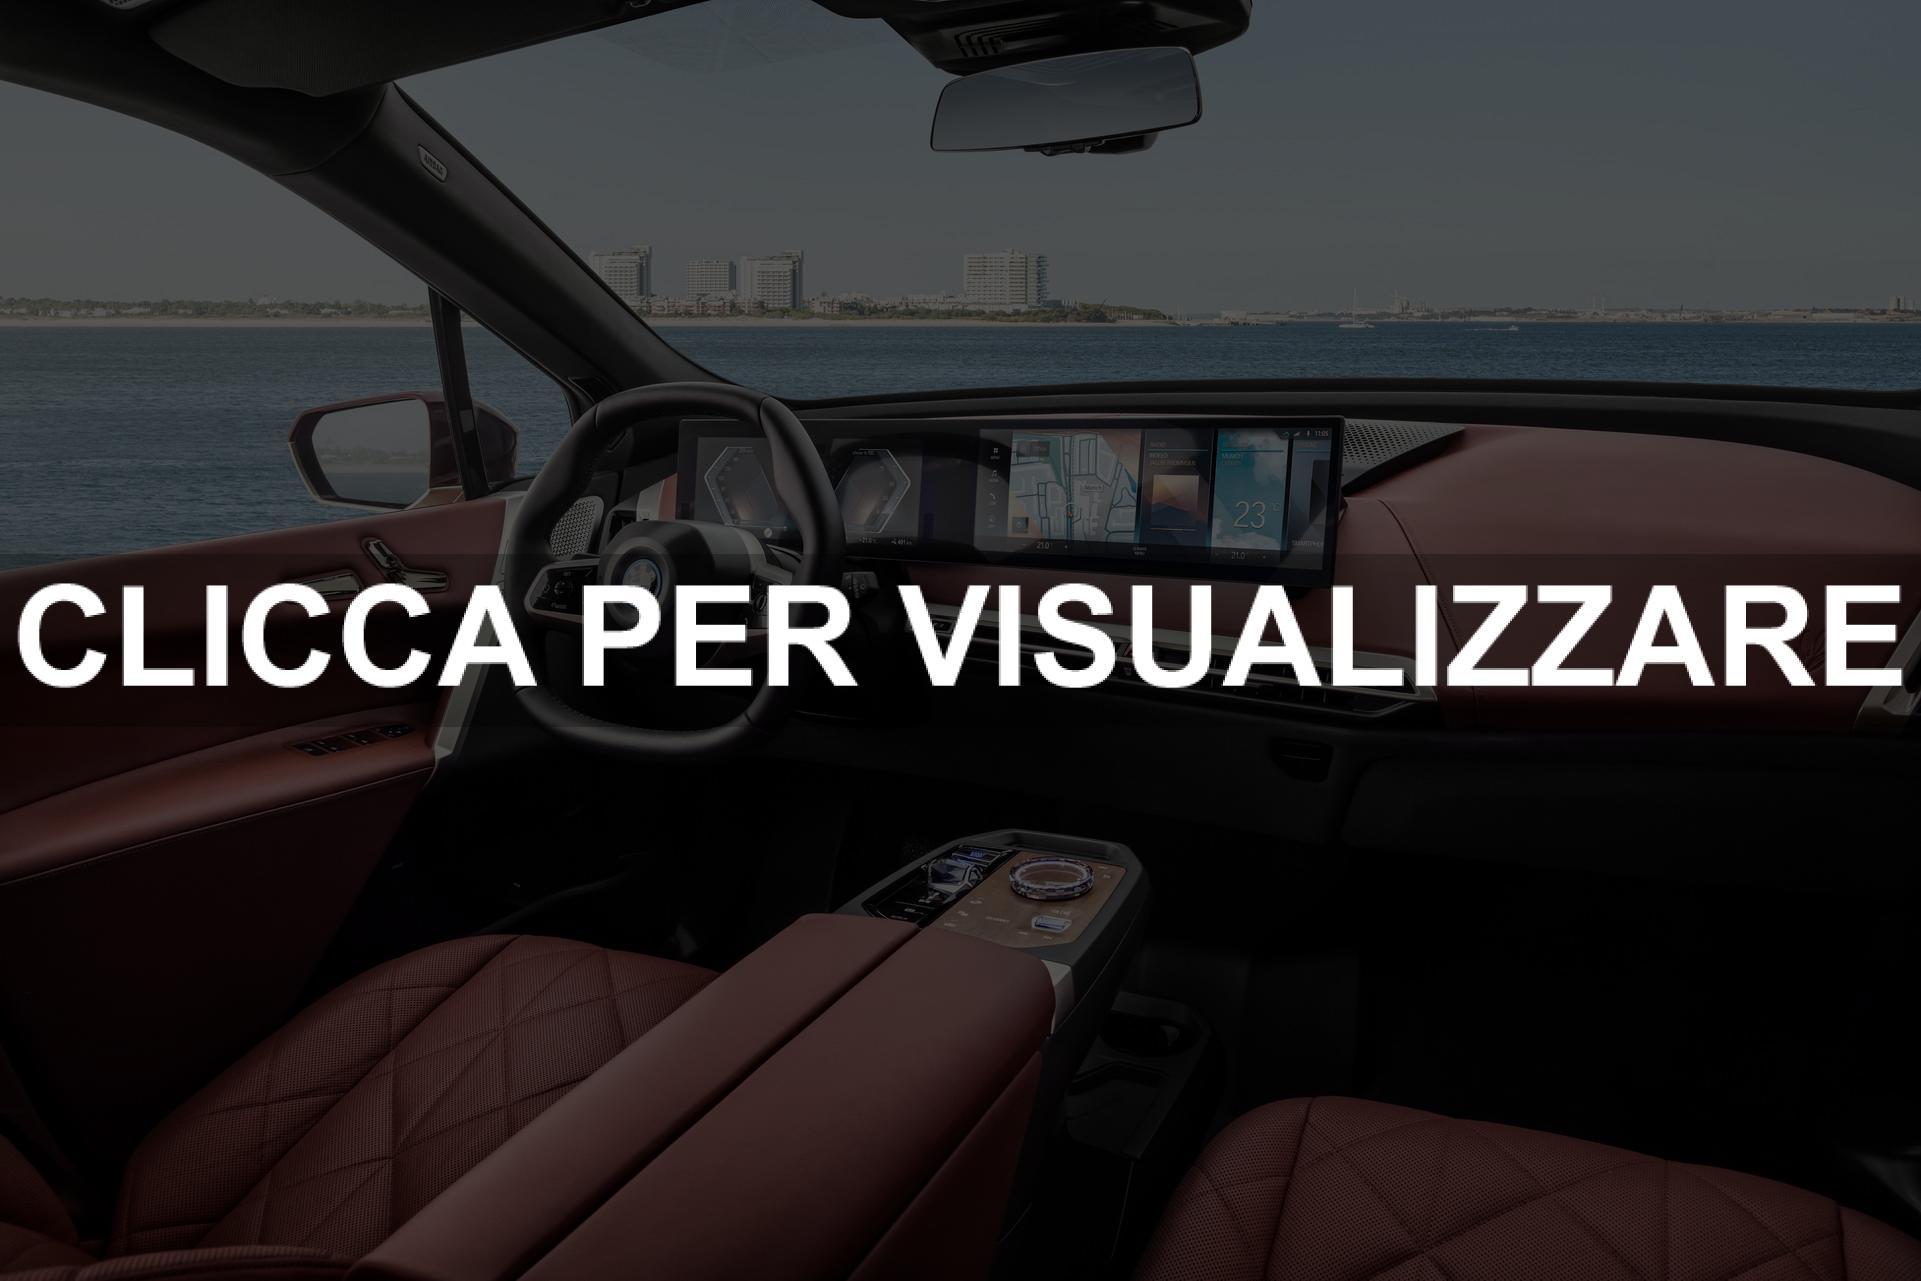 Foto interni nuova BMW iX 2021 elettrica